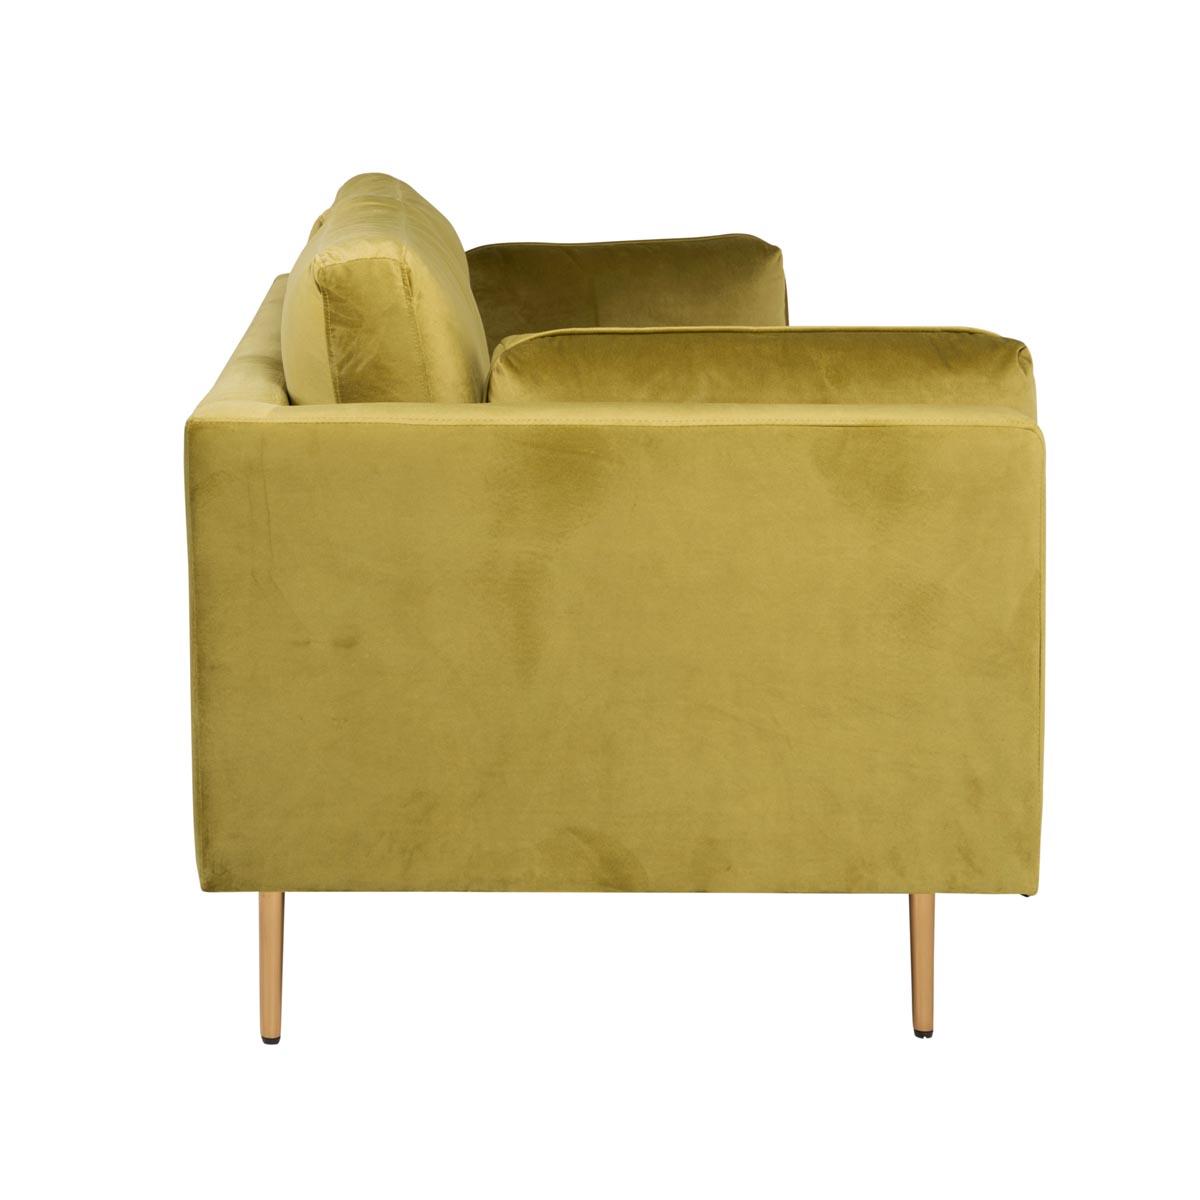 Boom-3-sits-soffa-gron-sammet-sida-18045-894